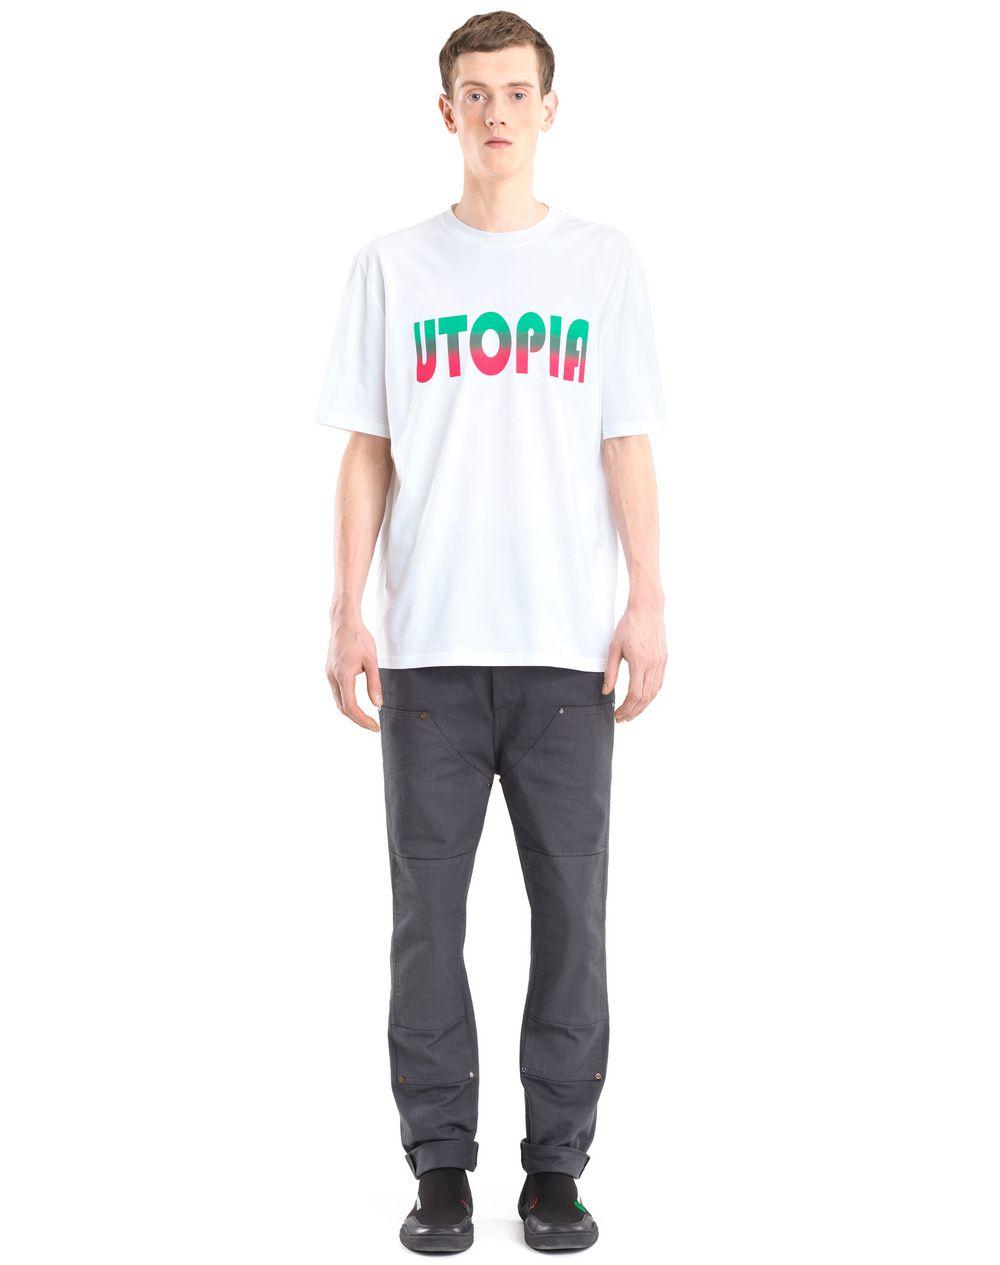 """UTOPIA"" T-SHIRT - Lanvin"